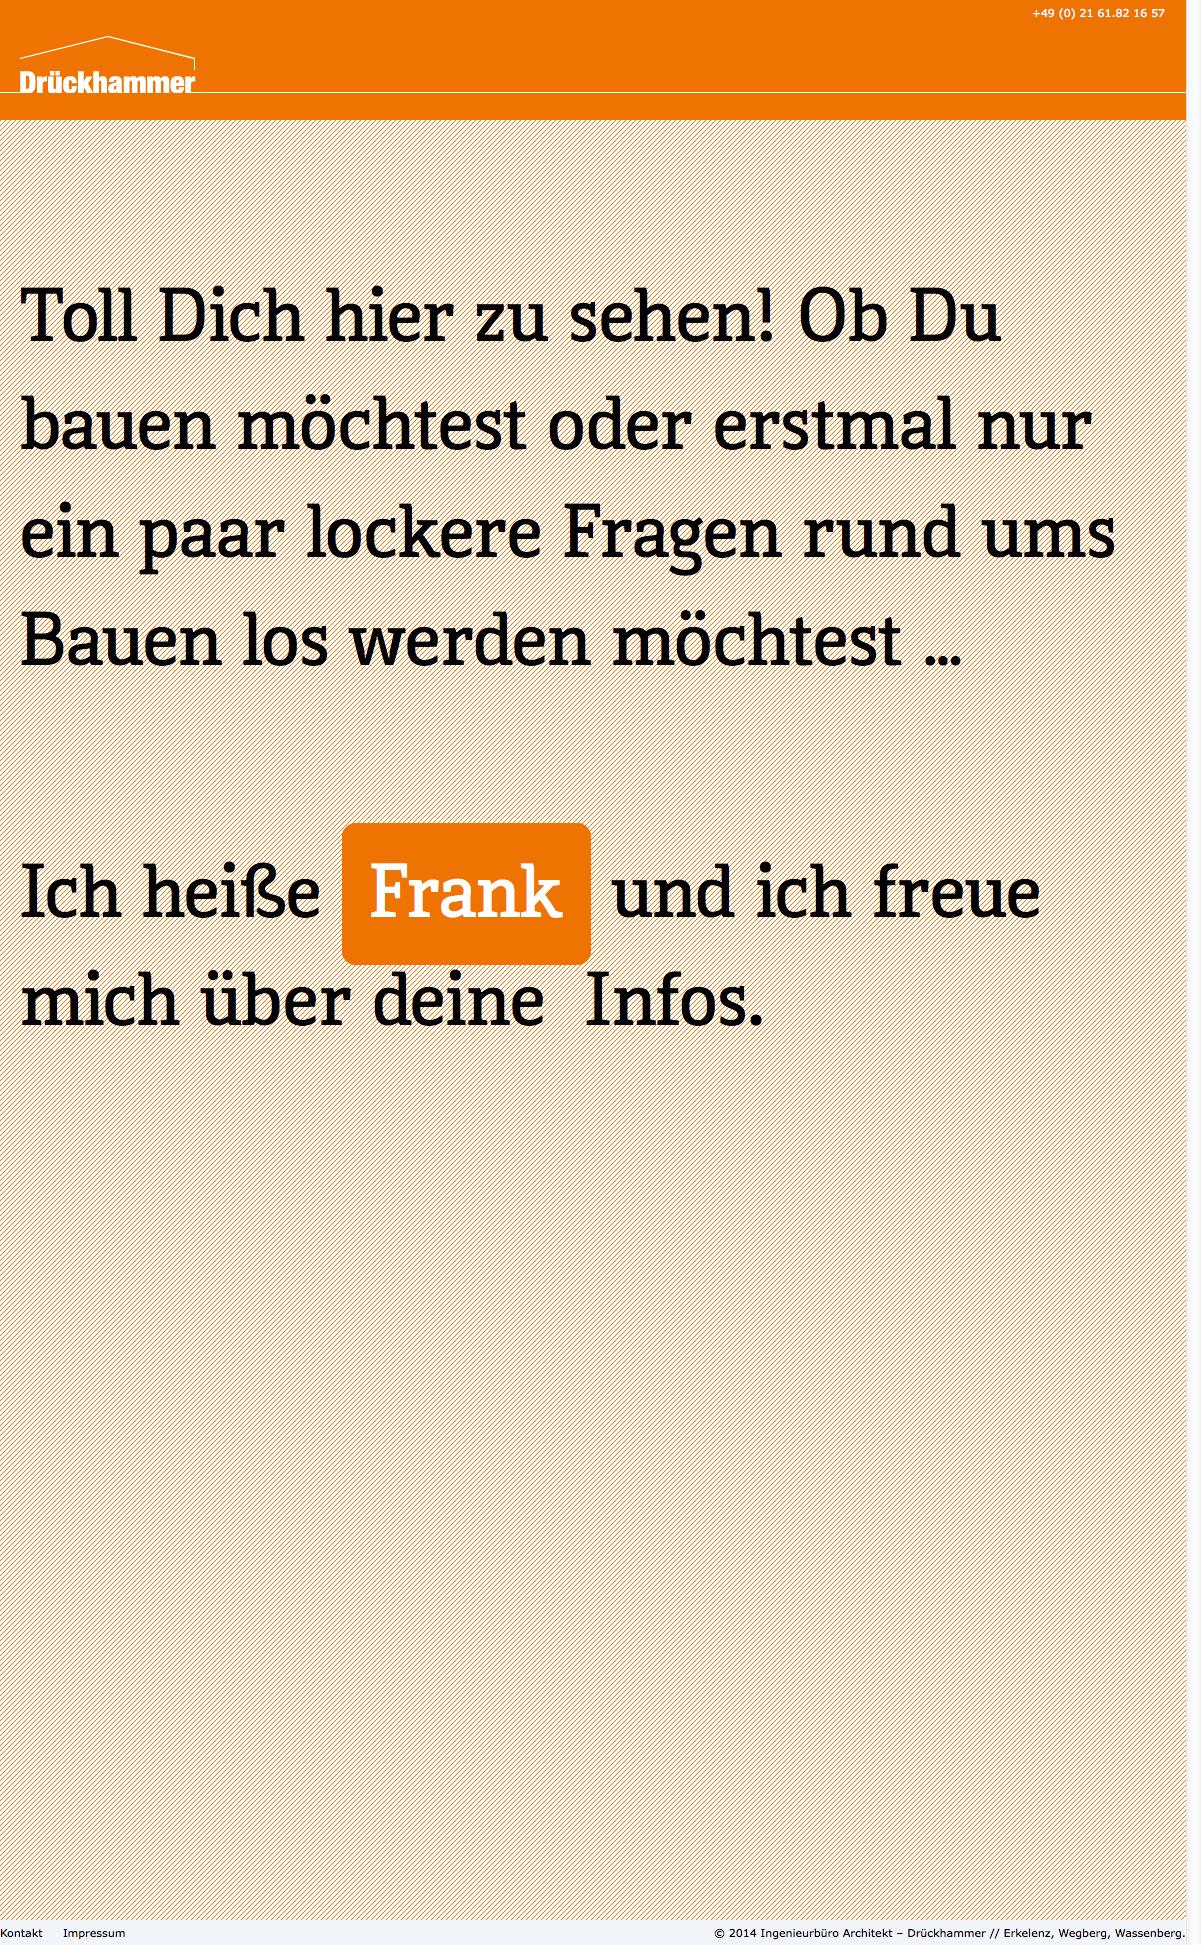 Duz mich! » Ingenieurbüro Architekt - Drückhammer -- Erkelenz, Wegberg, Wassenberg